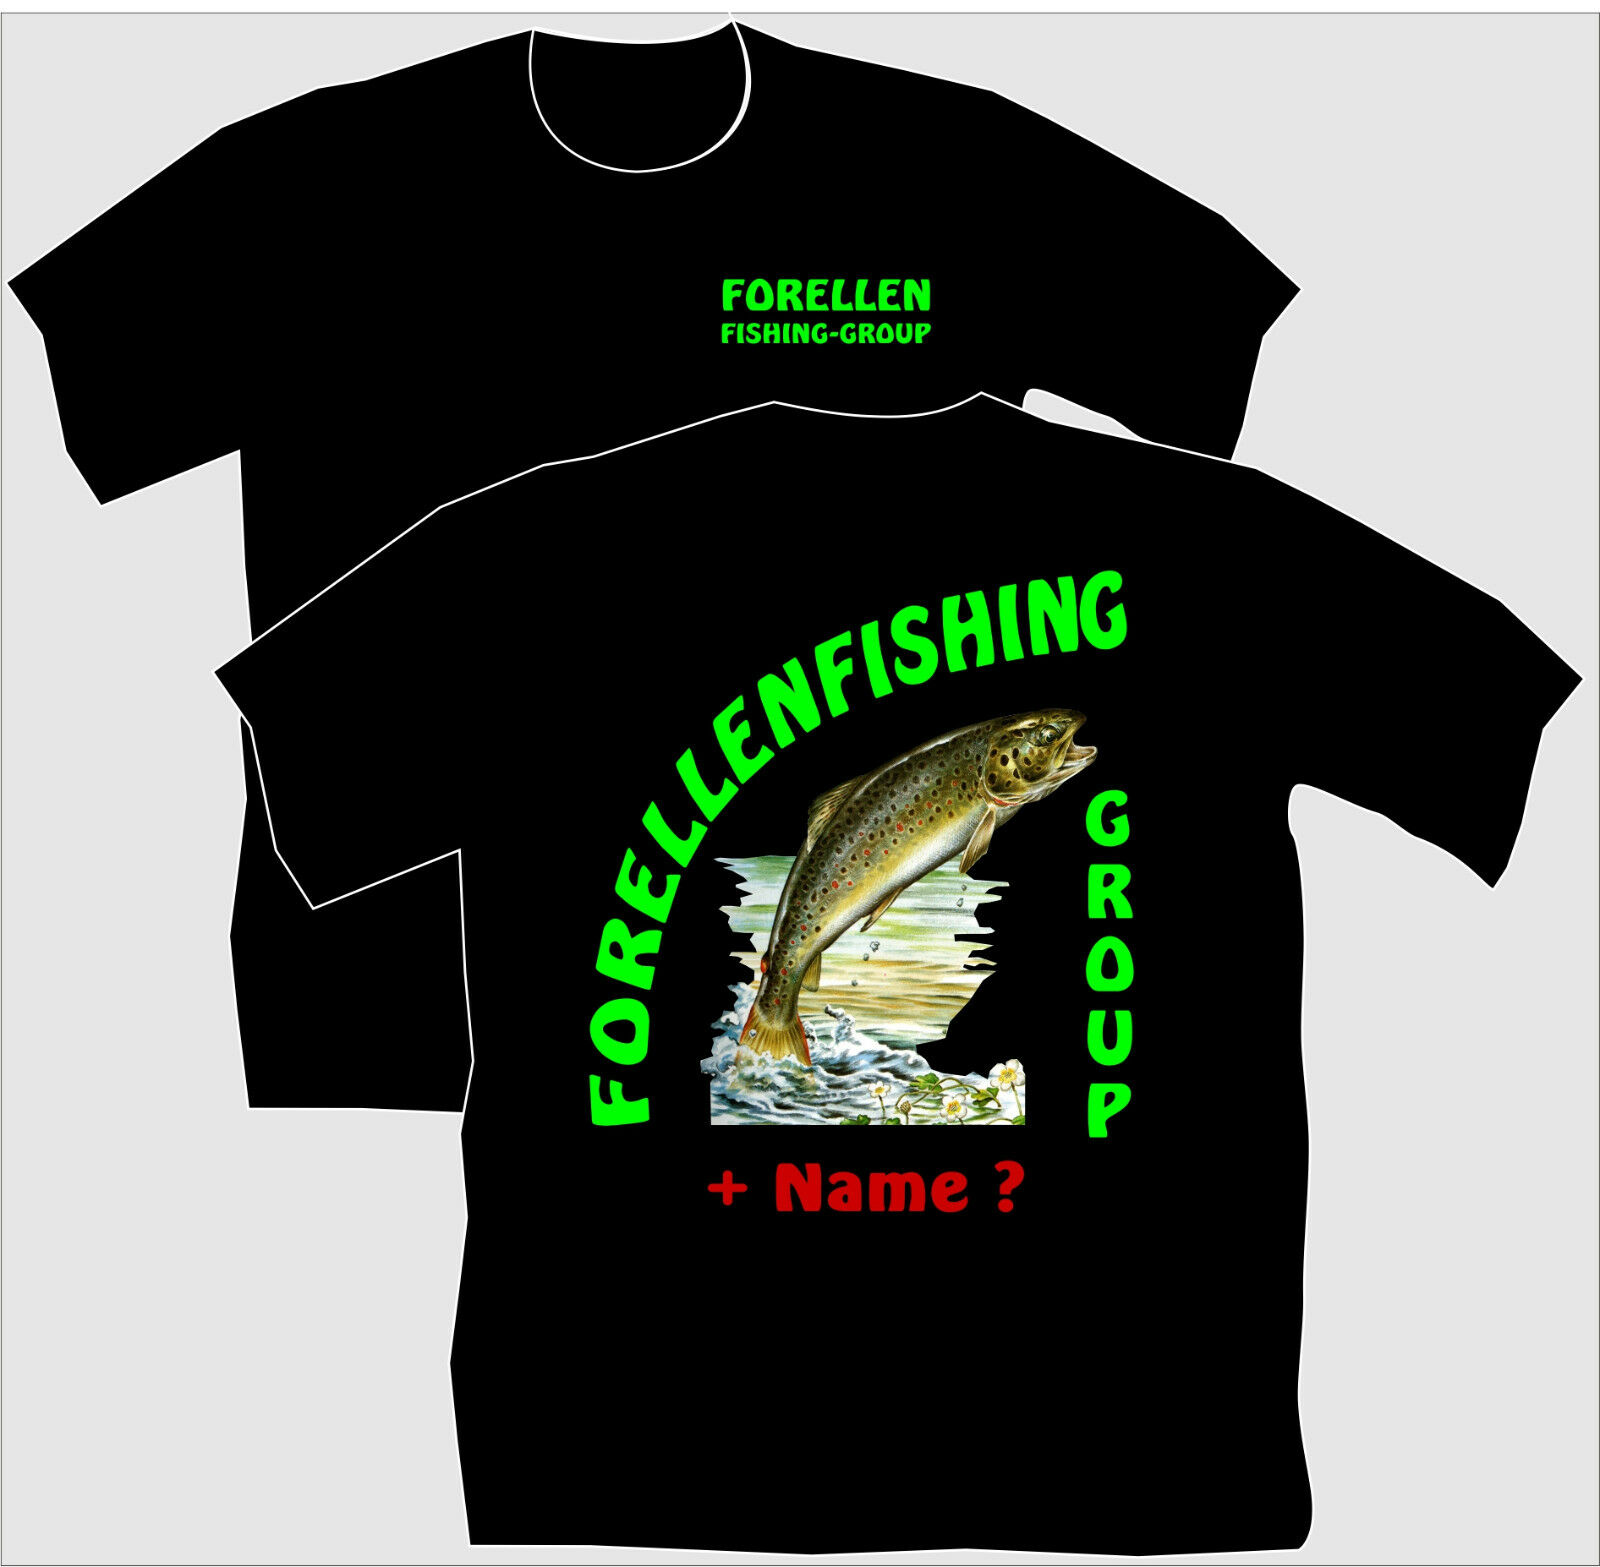 Anglershirt Angler T-Shirt Forellenangeln Forellen Angeln Spinnangeln Fliegen Fliegen Fliegen 61  barato